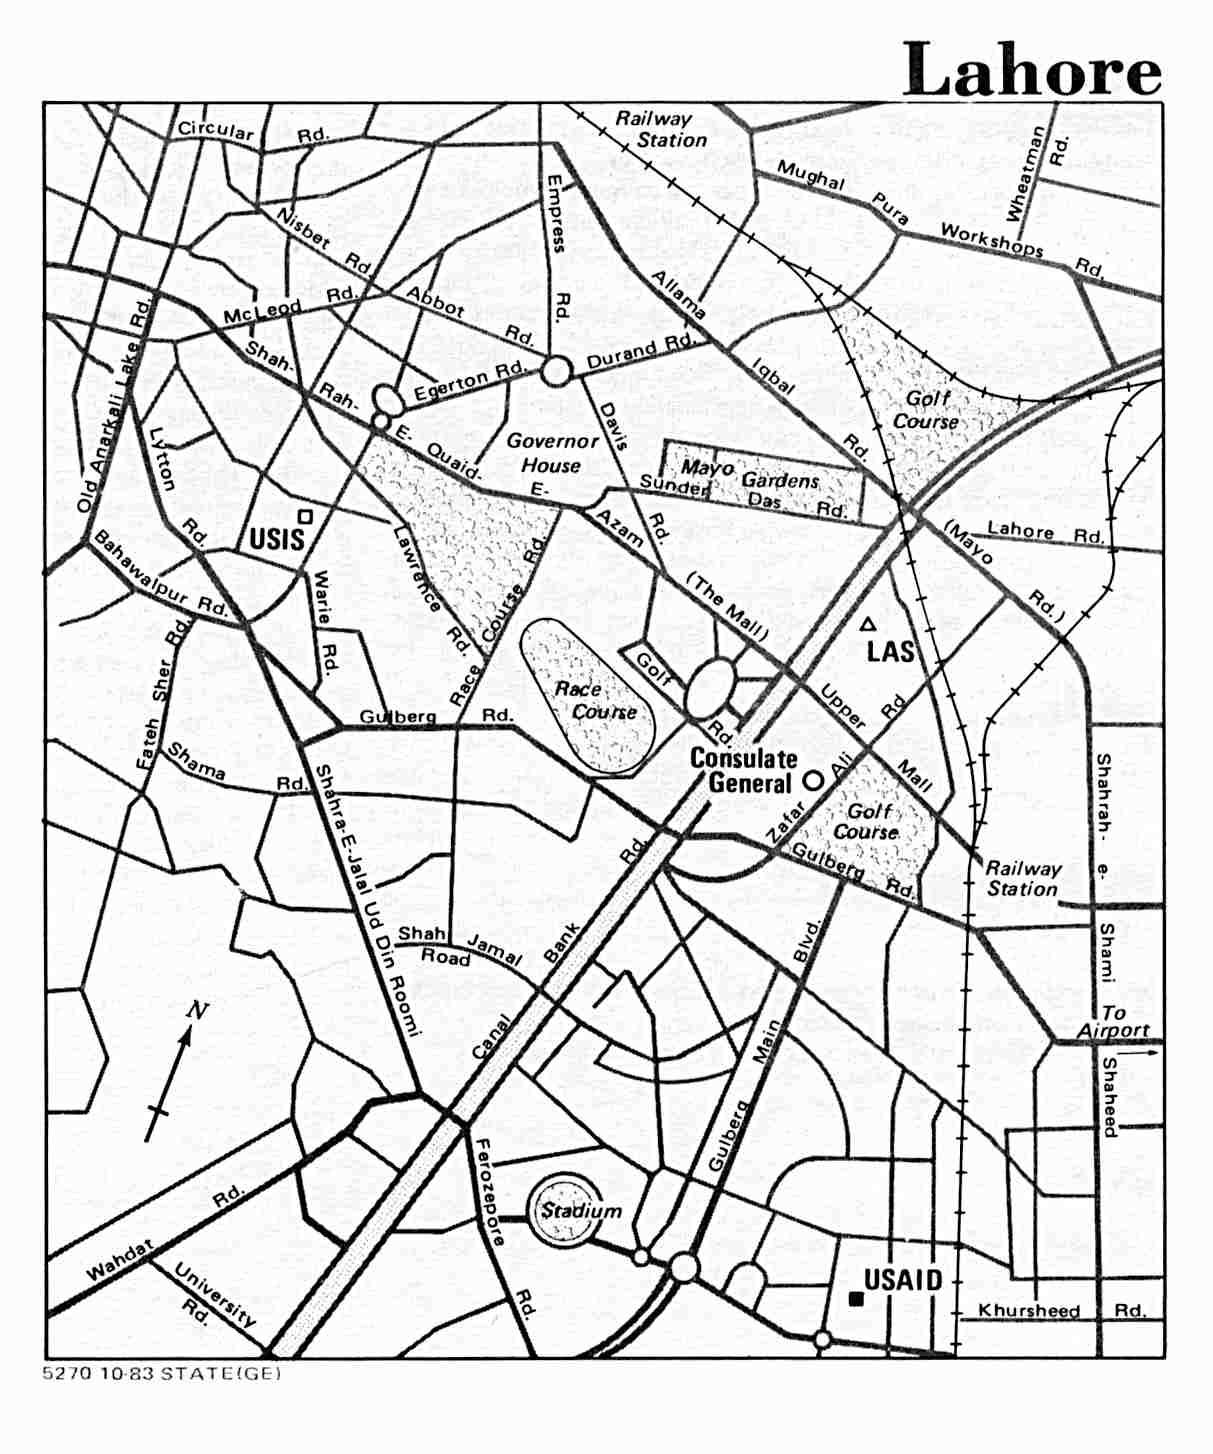 Urban Centers Maps Of Pakistan City Maps Sindh Map Balochistan Map History Maps